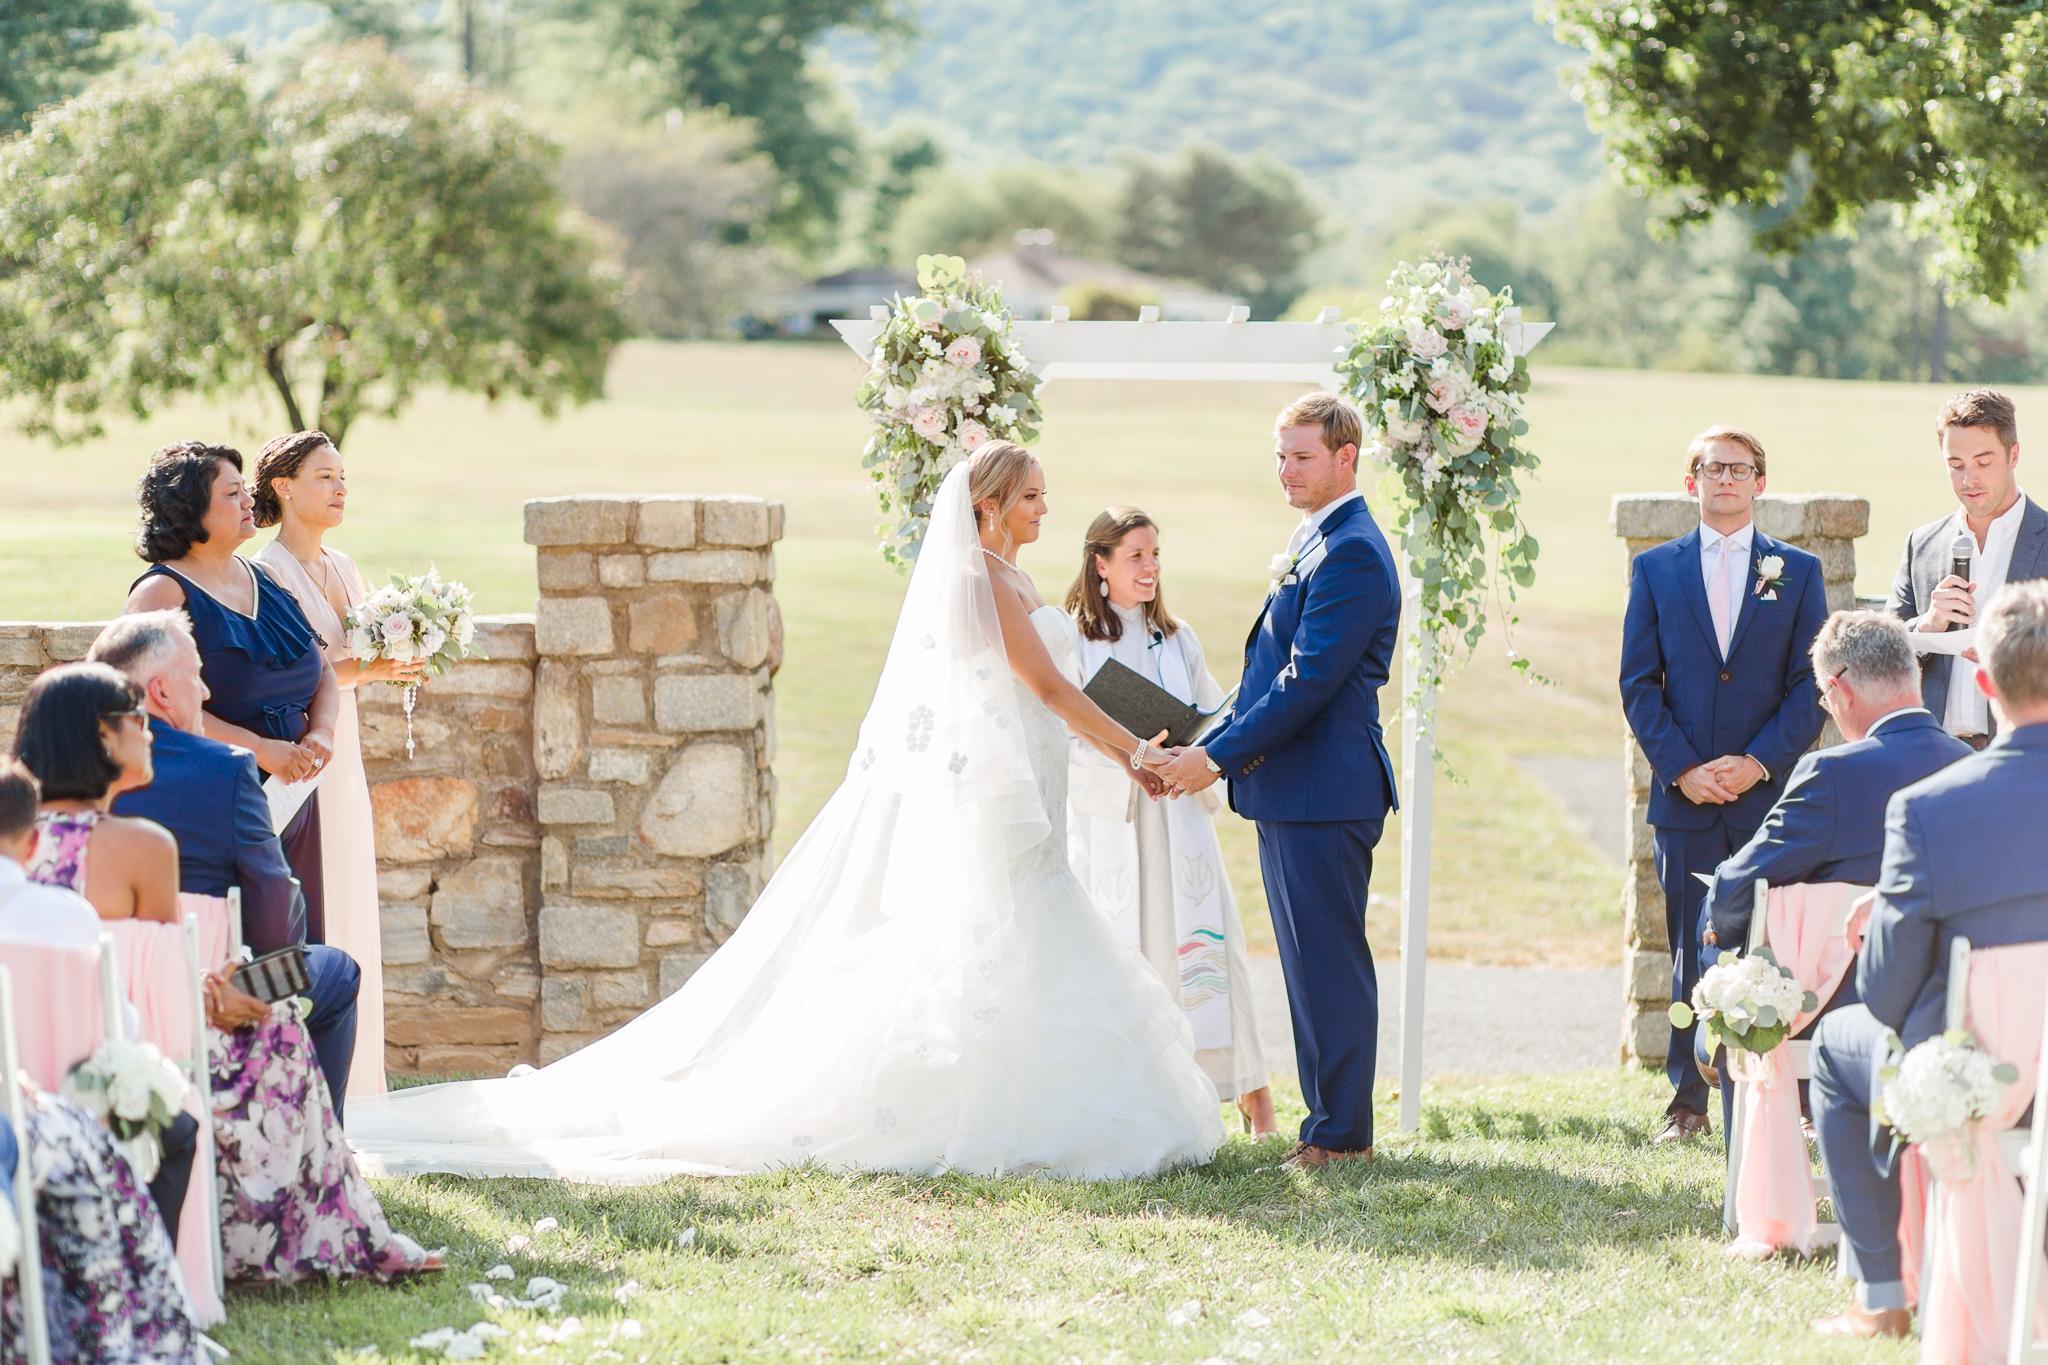 Catie & Elliott   Married-239 copy.jpg